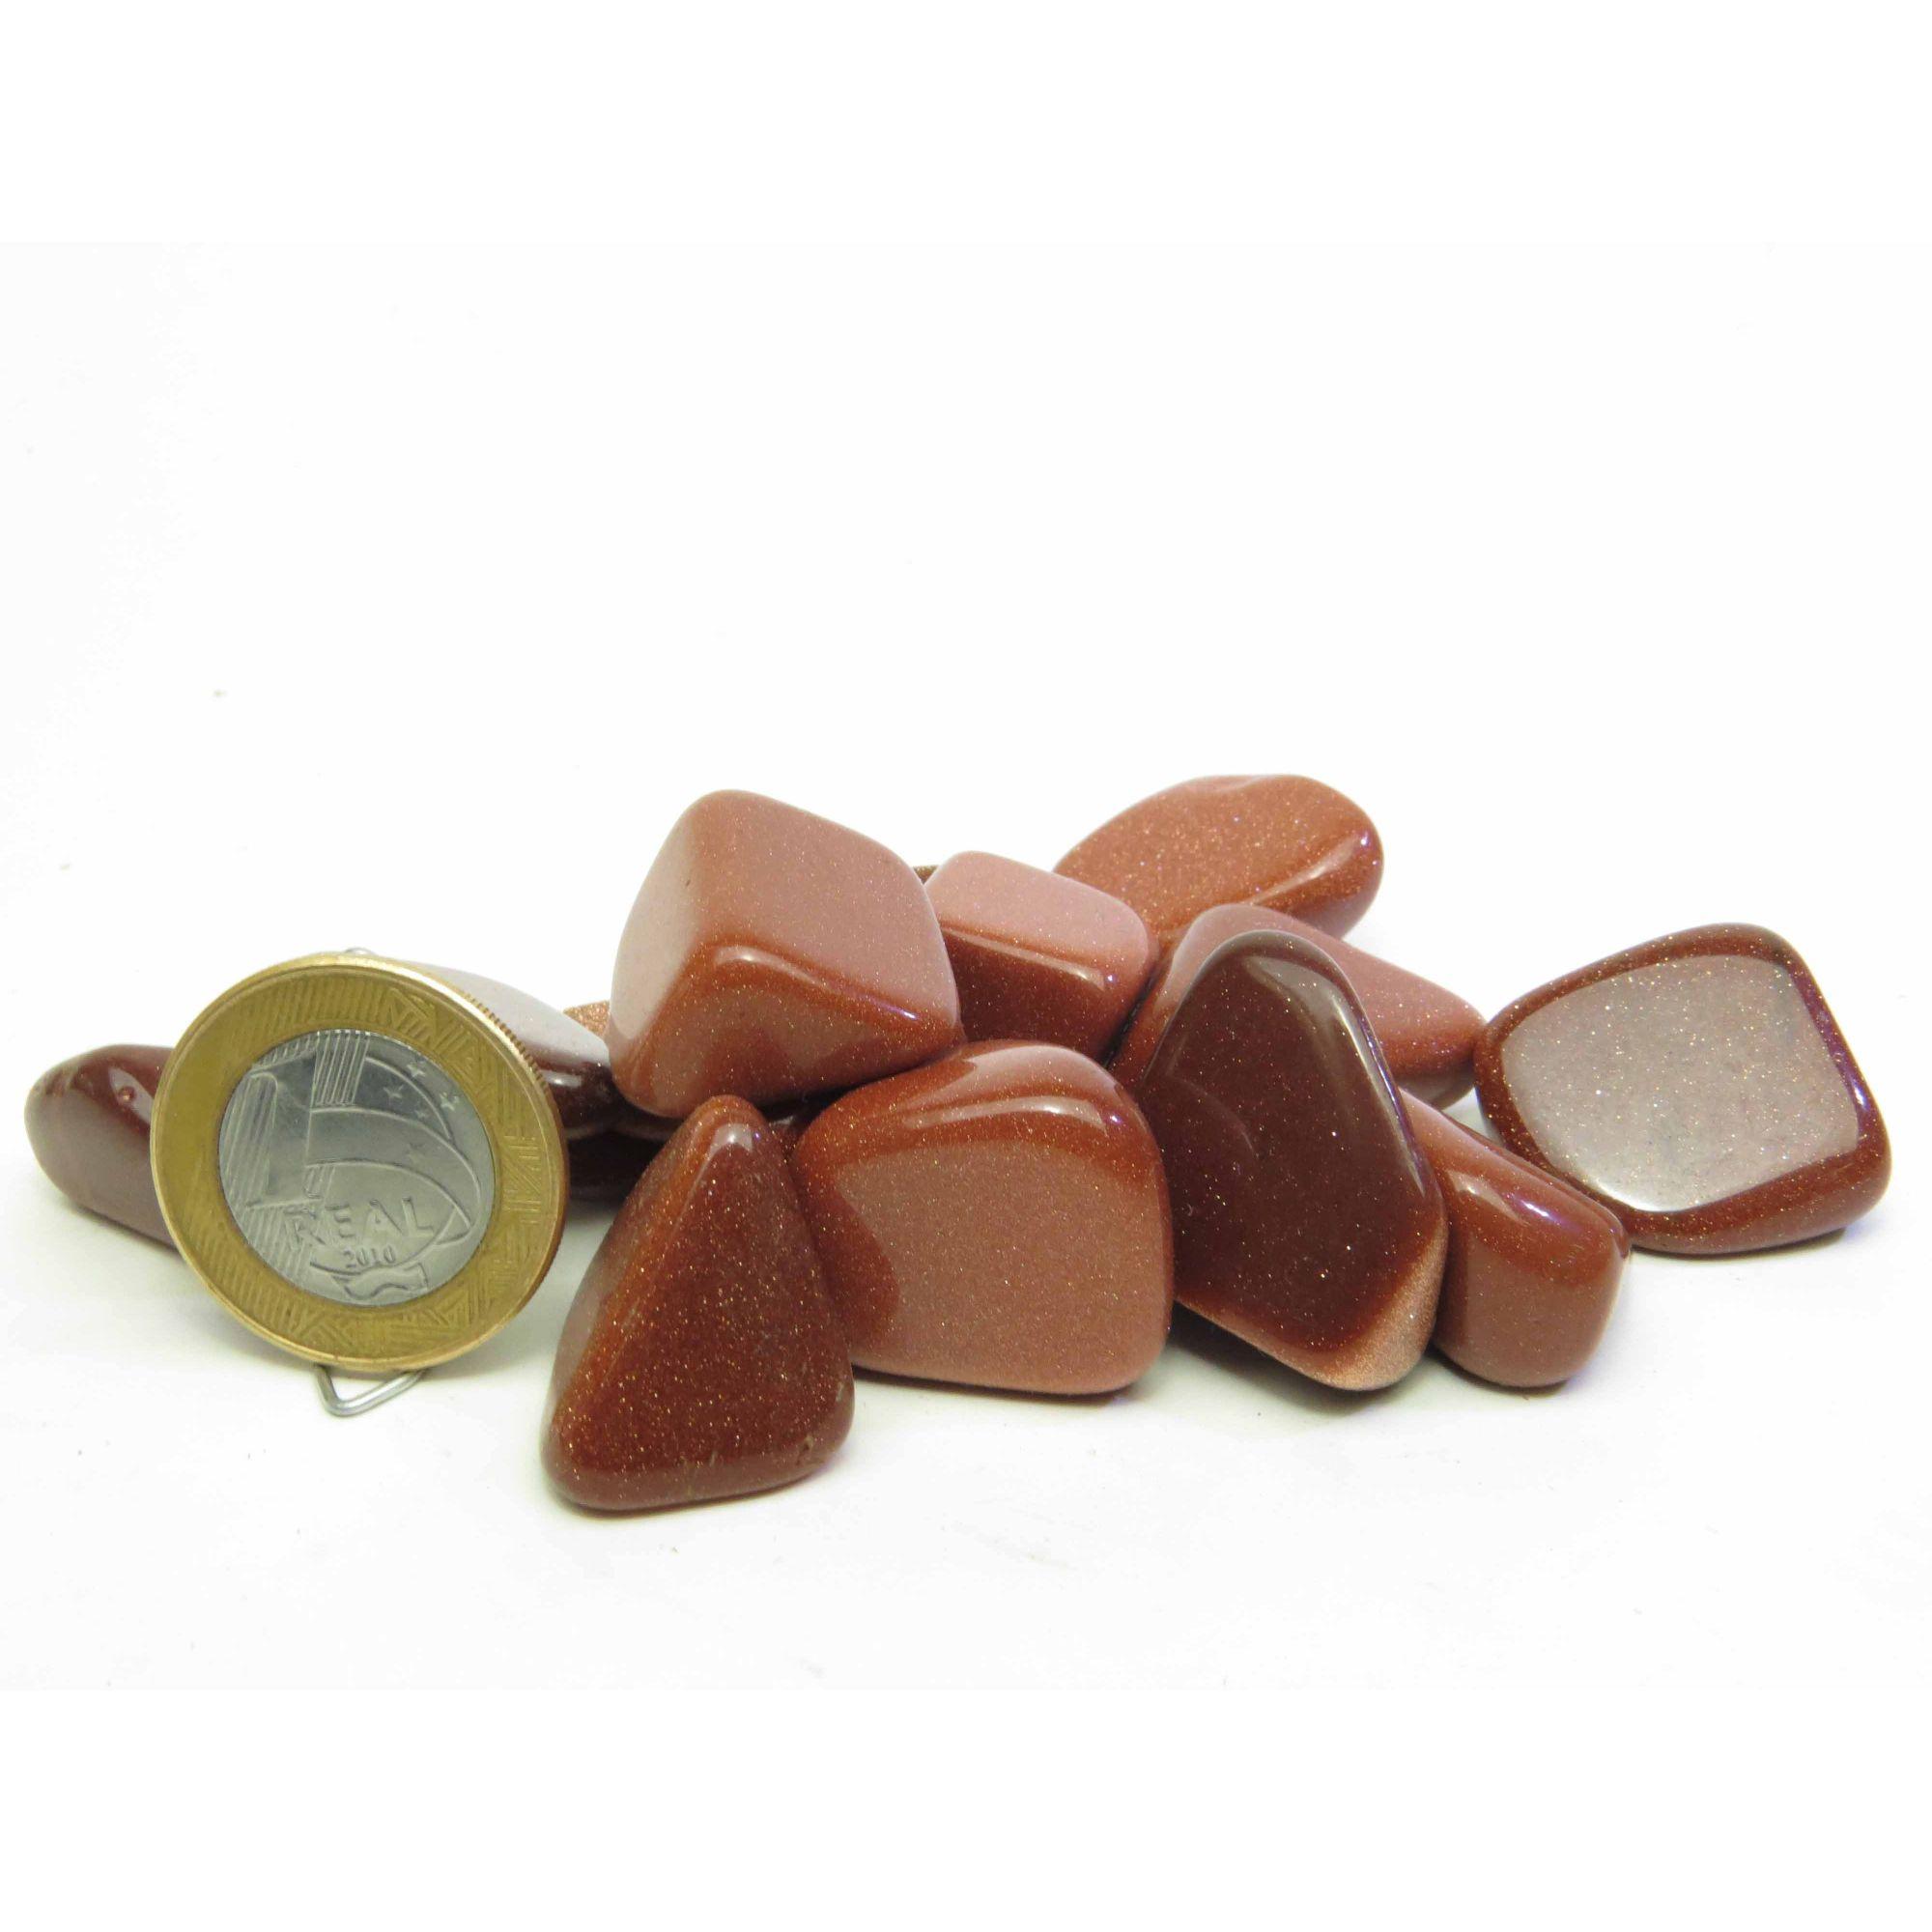 Pedra do Sol Rolada Sintética - Amostra Pequena | AP7 - 2 a 3 cm